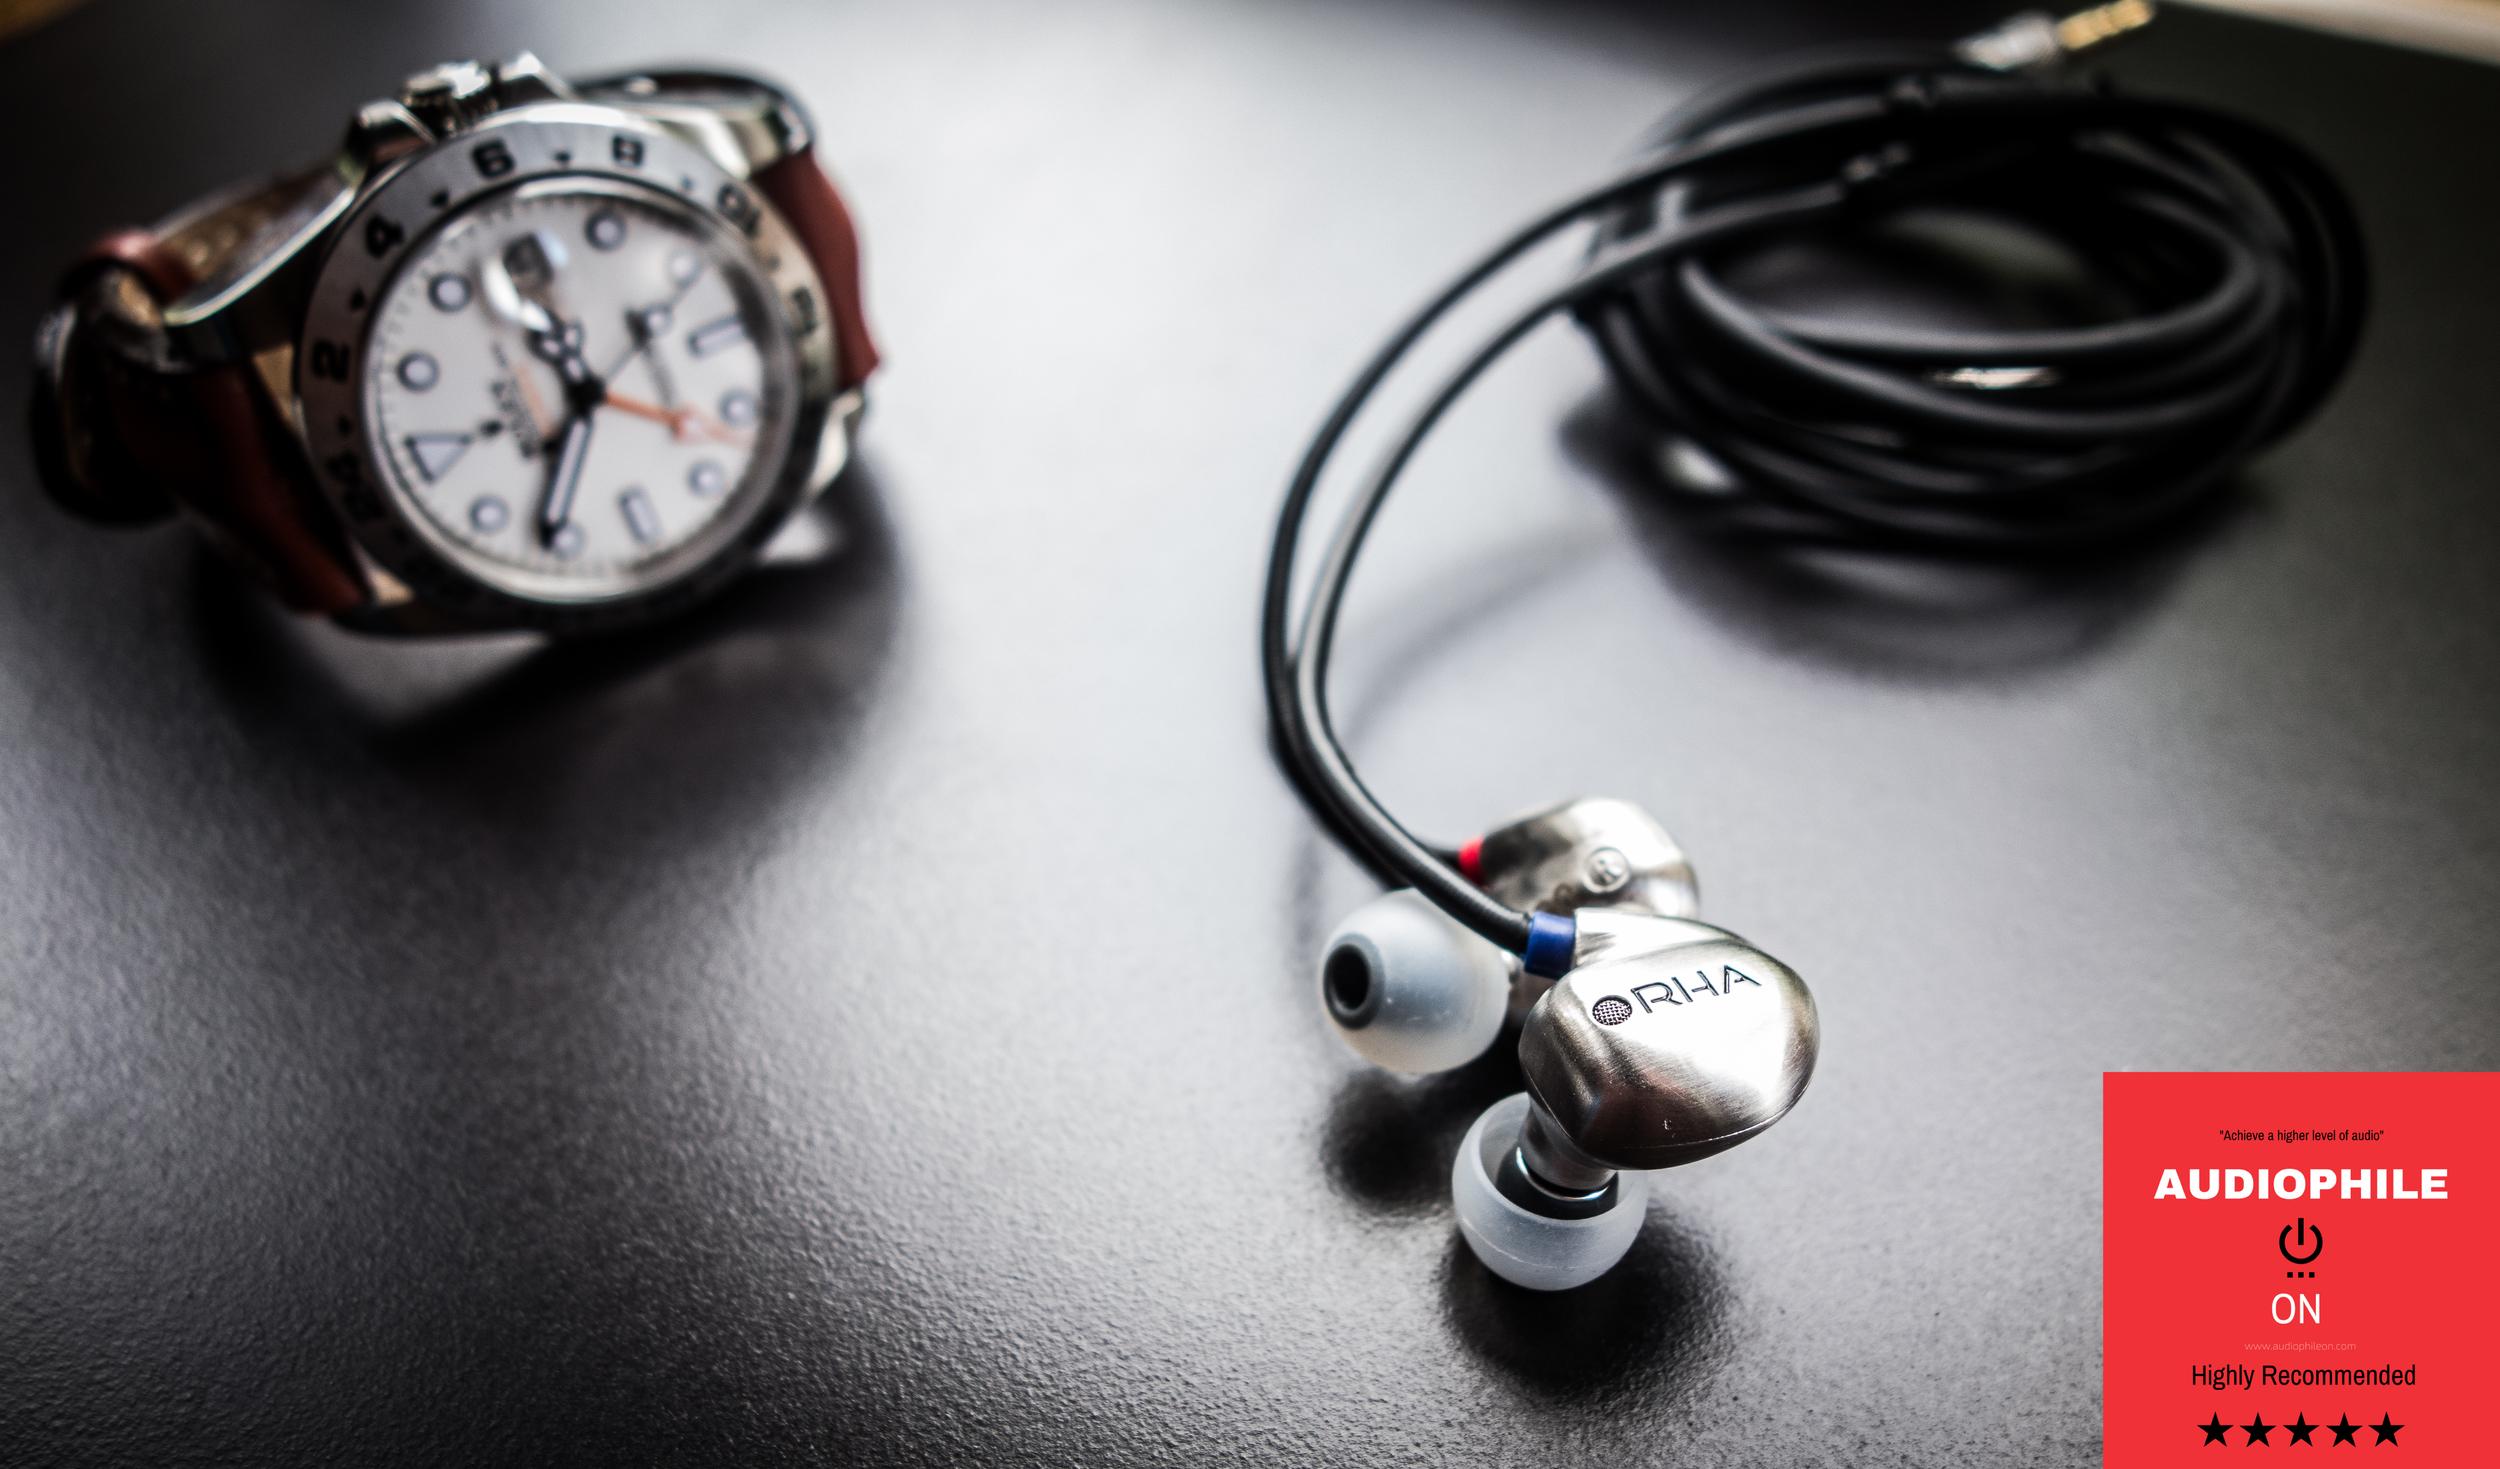 The new RHA T20 earphones